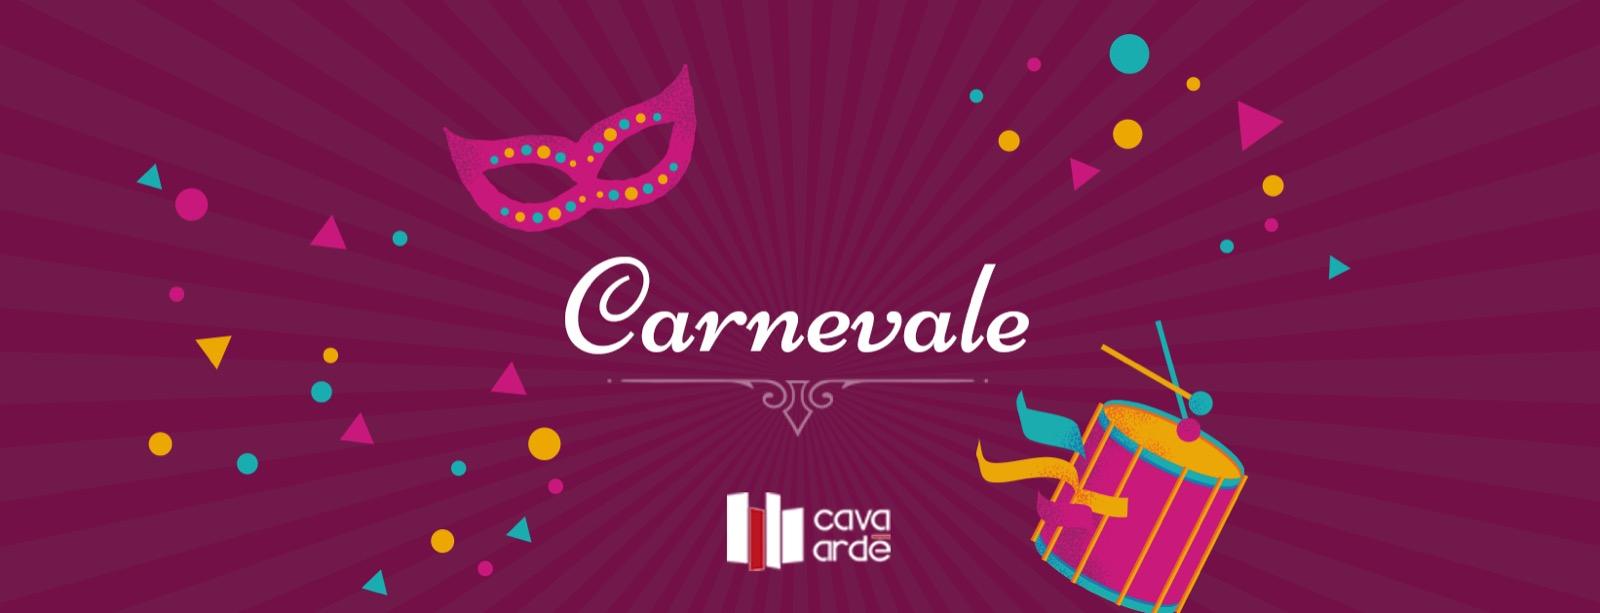 Carnevale Cava Arde